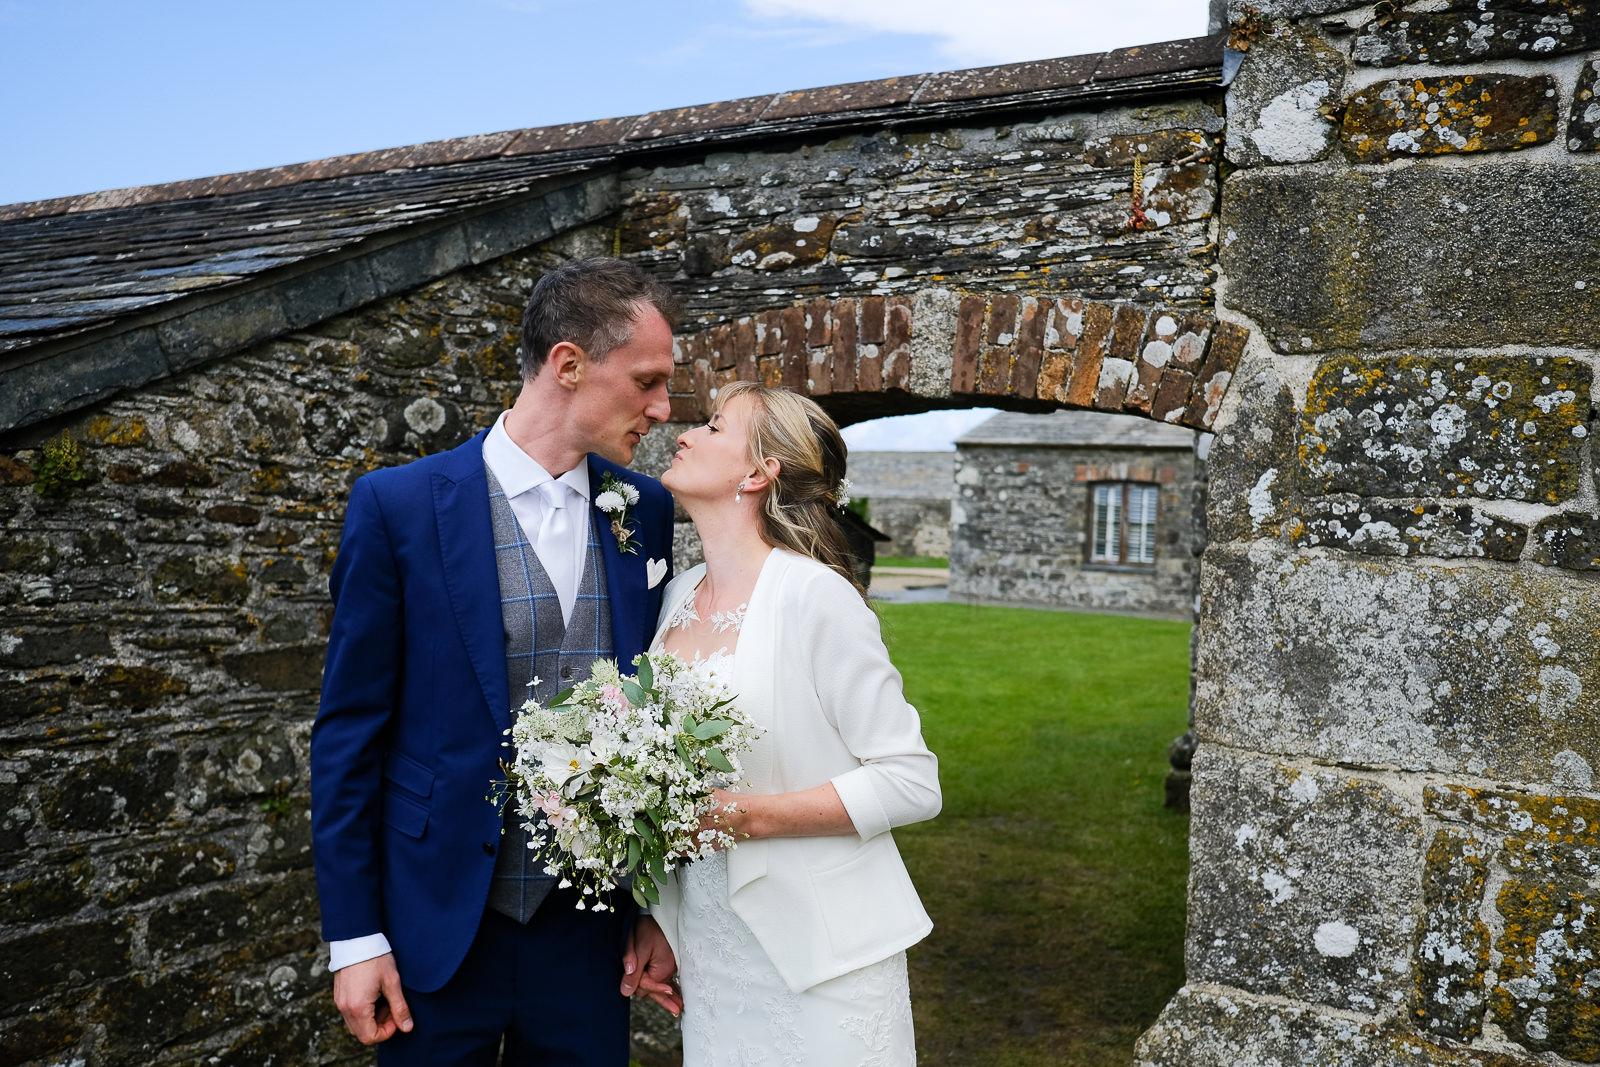 Roscarrock Farm wedding in Cornwall 037.jpg